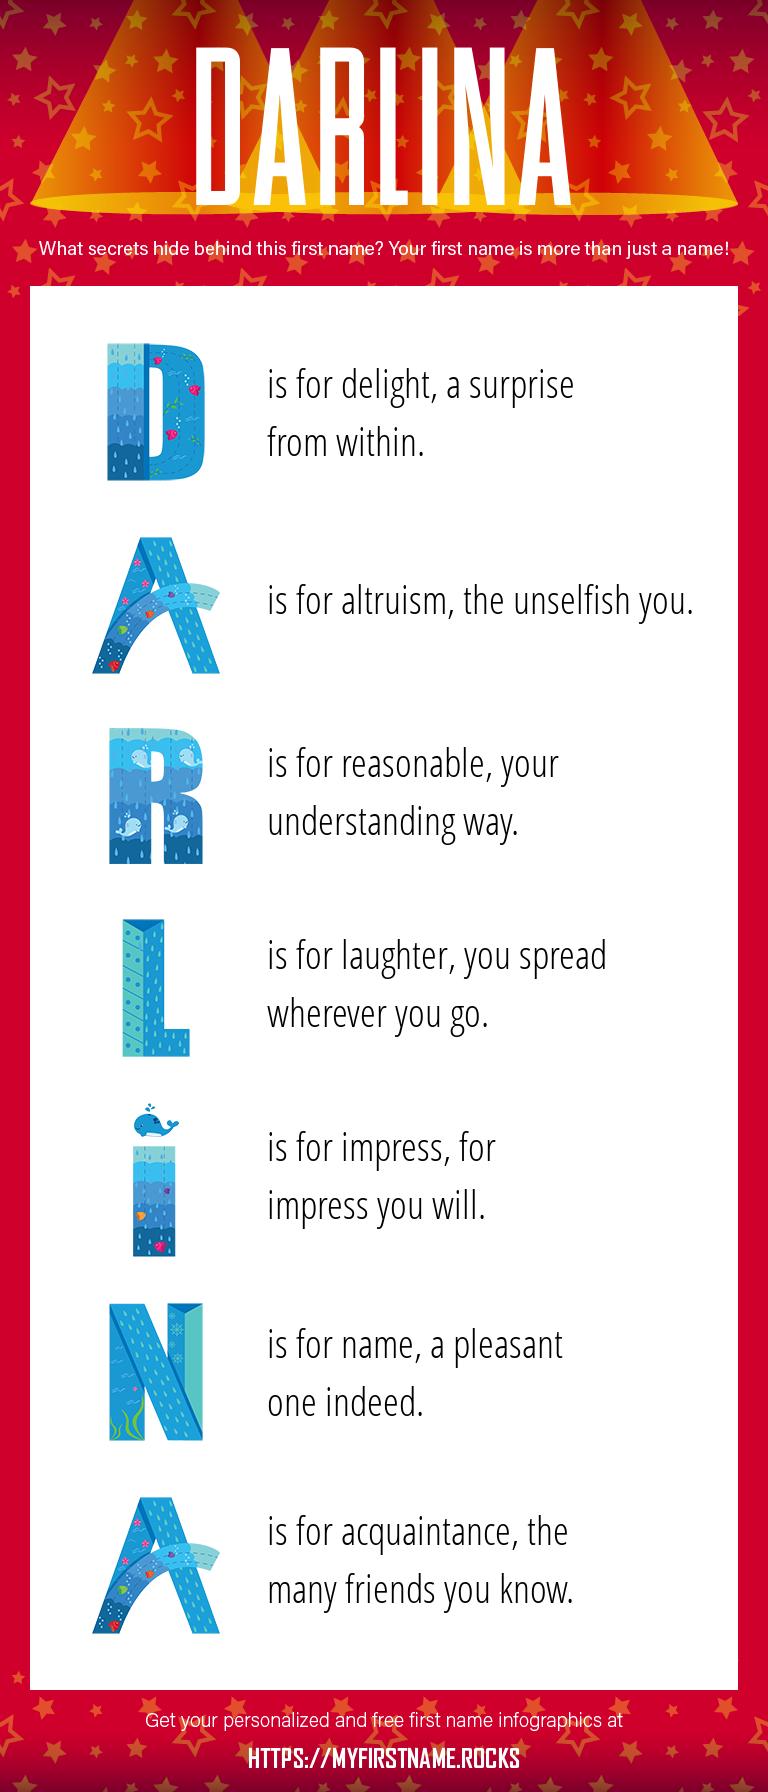 Darlina Infographics